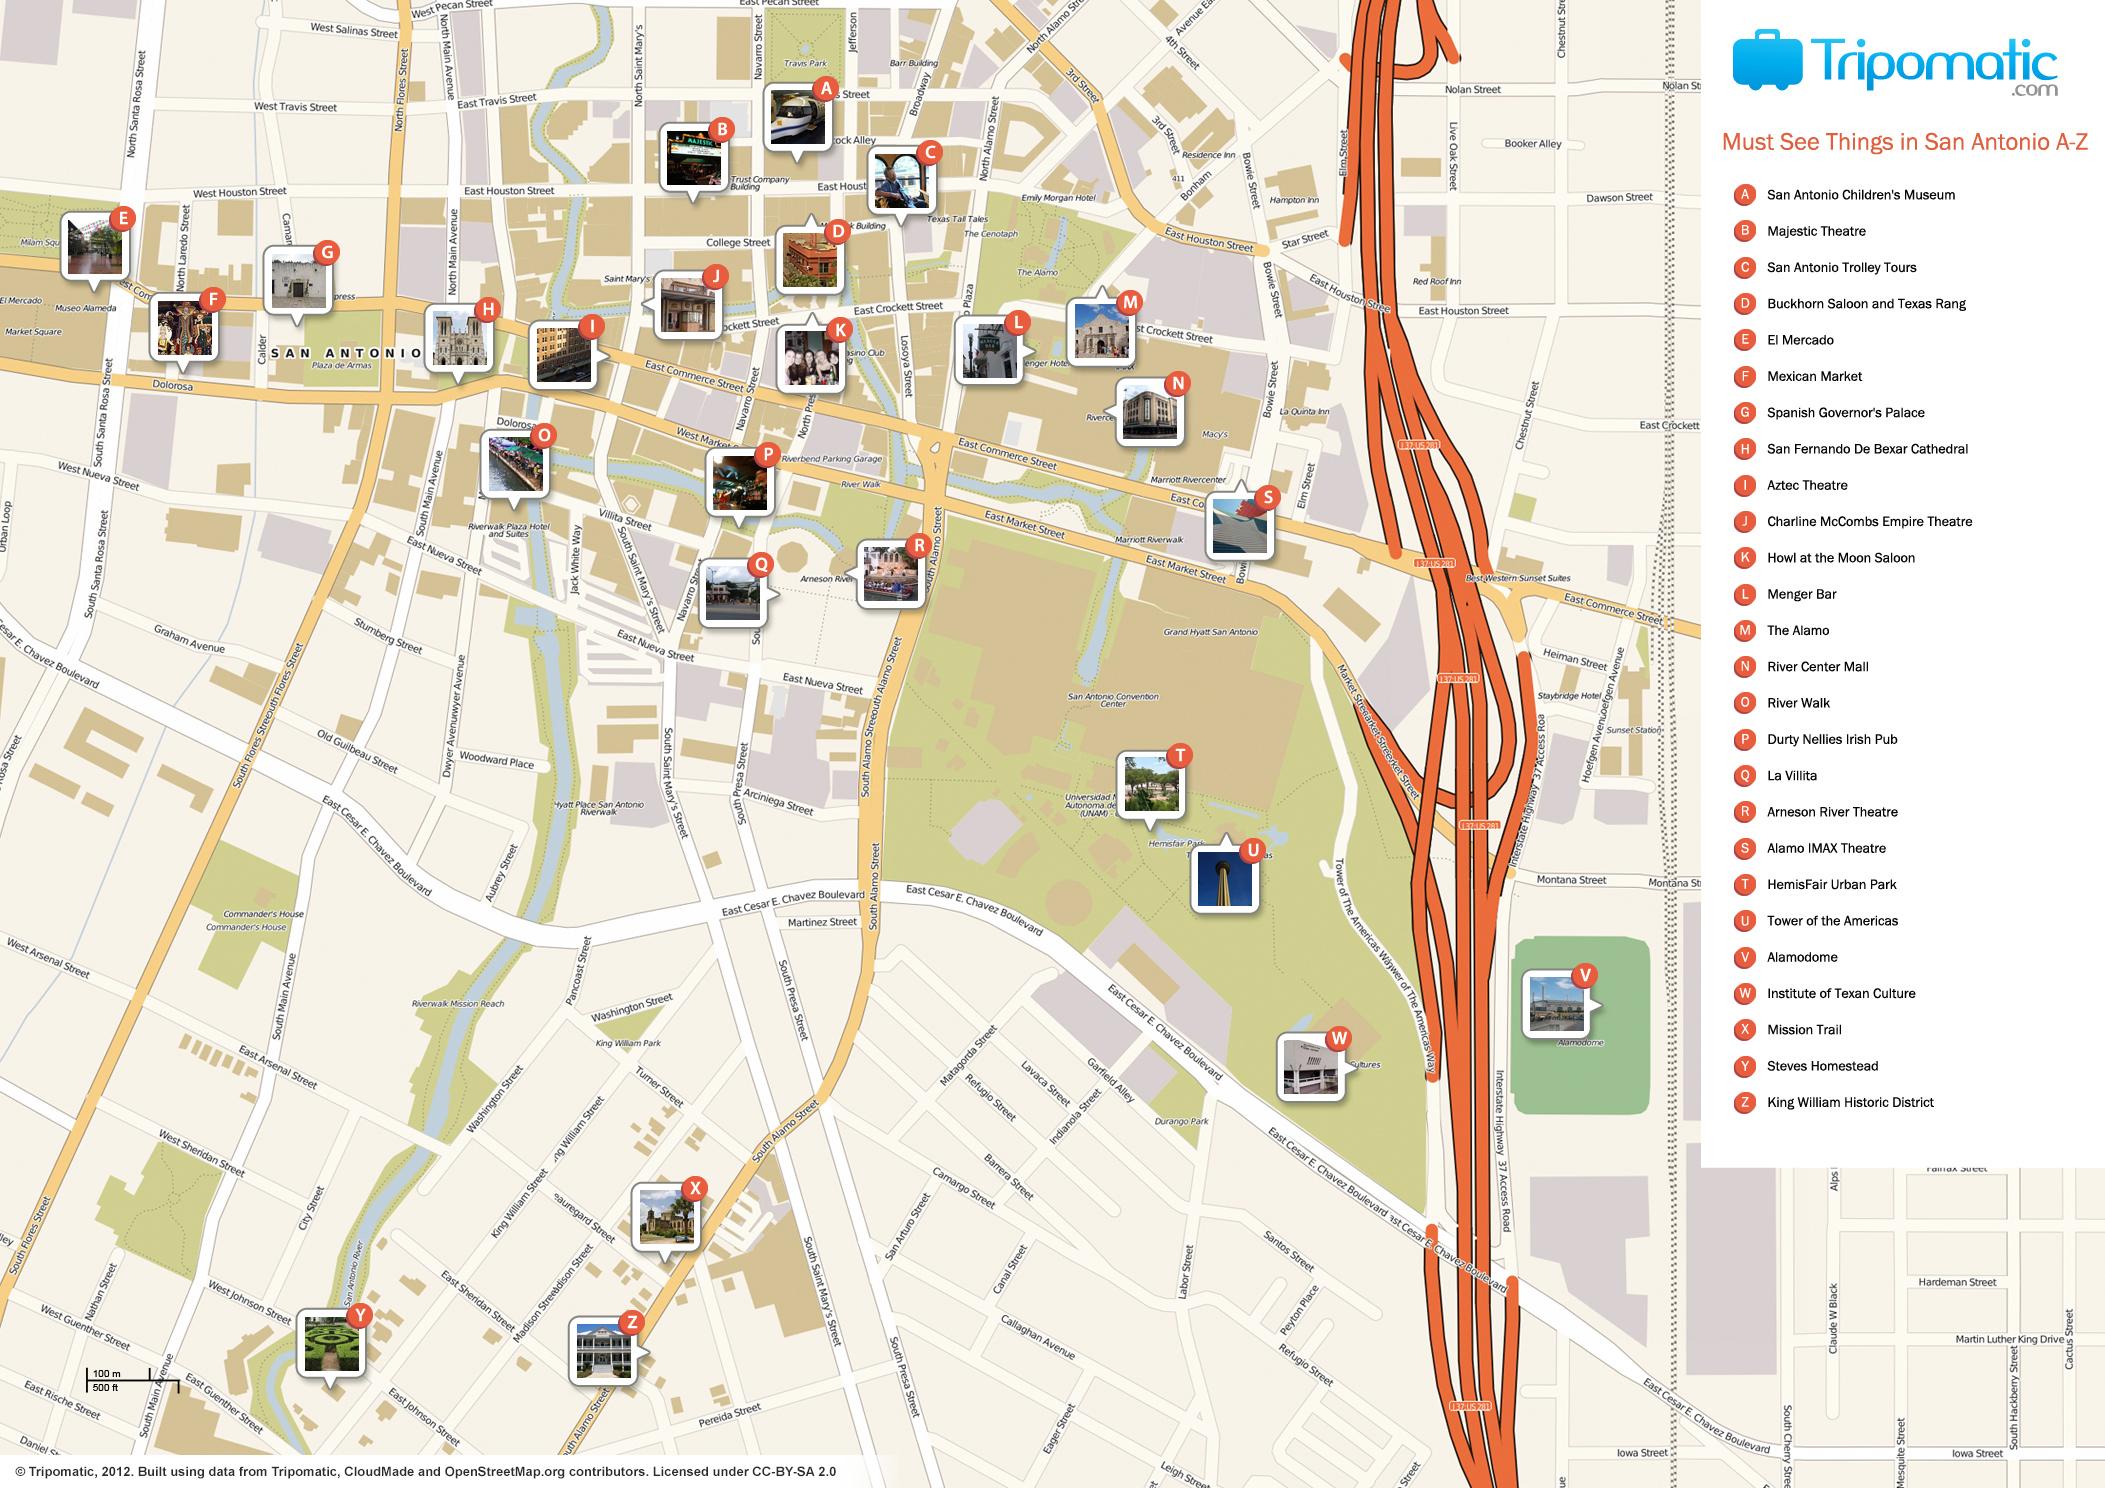 San Antonio Printable Tourist Attractions Map